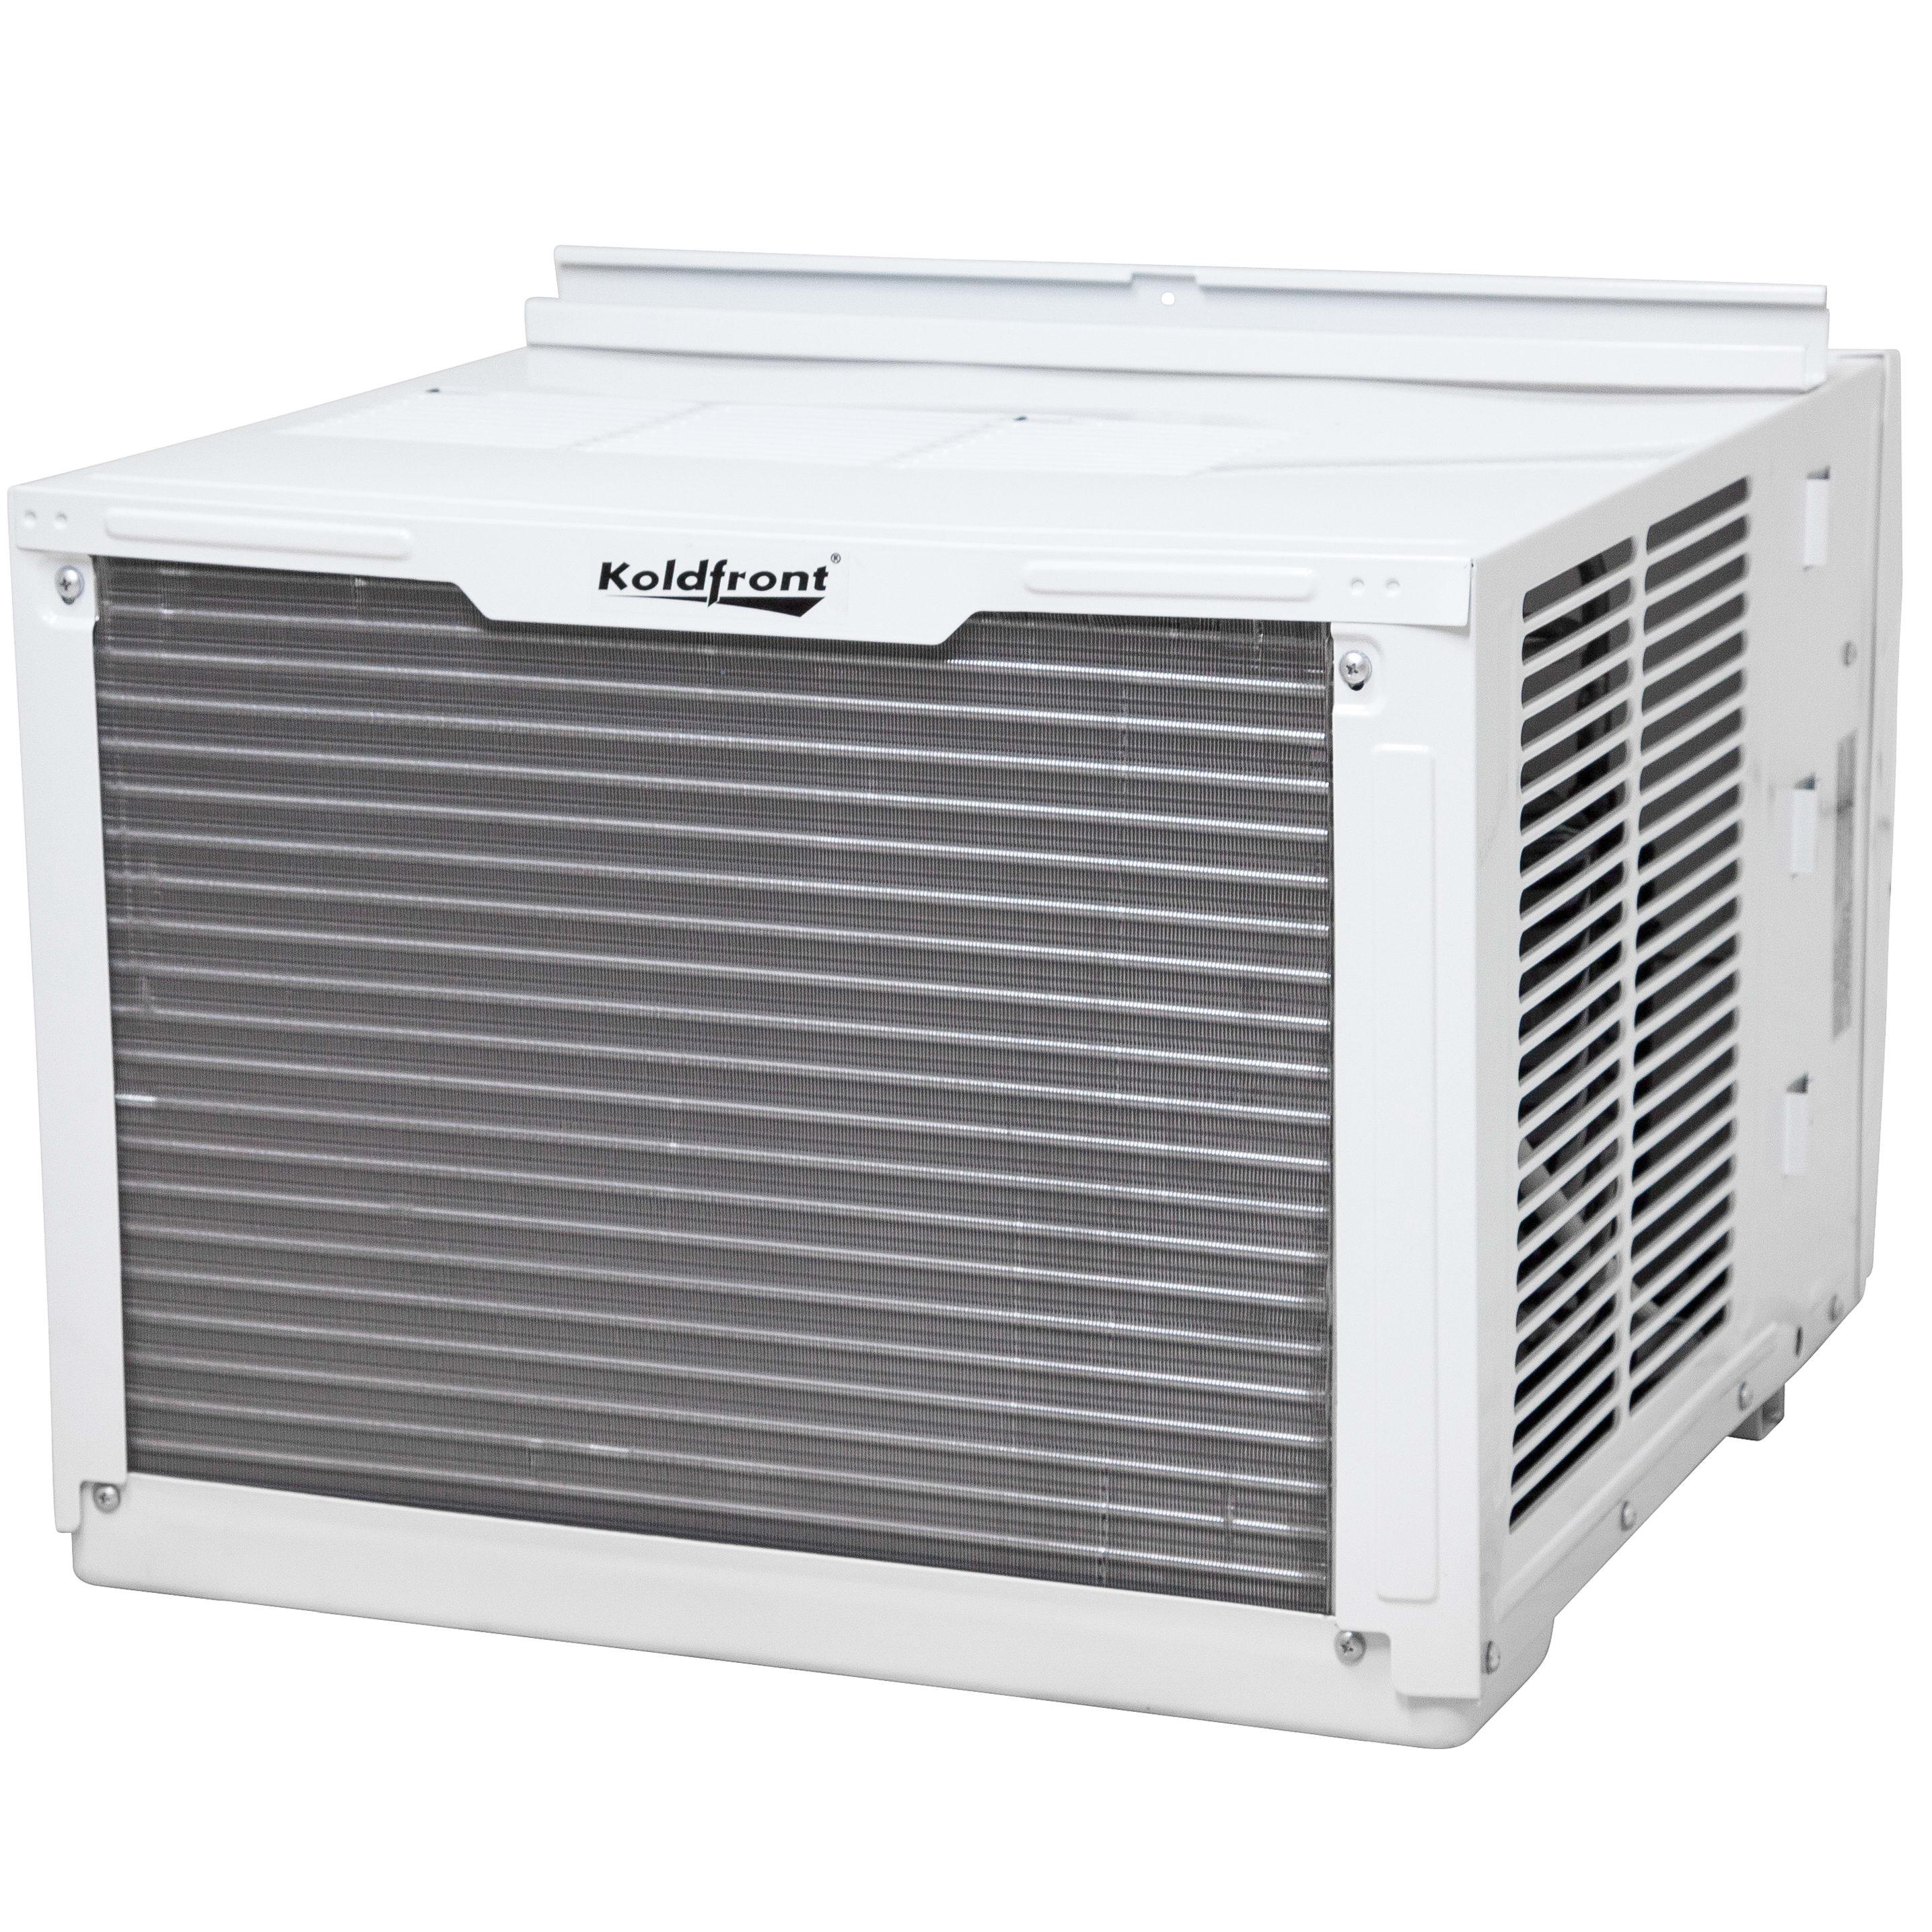 koldfront wac10002wco 10 000 btu window air conditioner